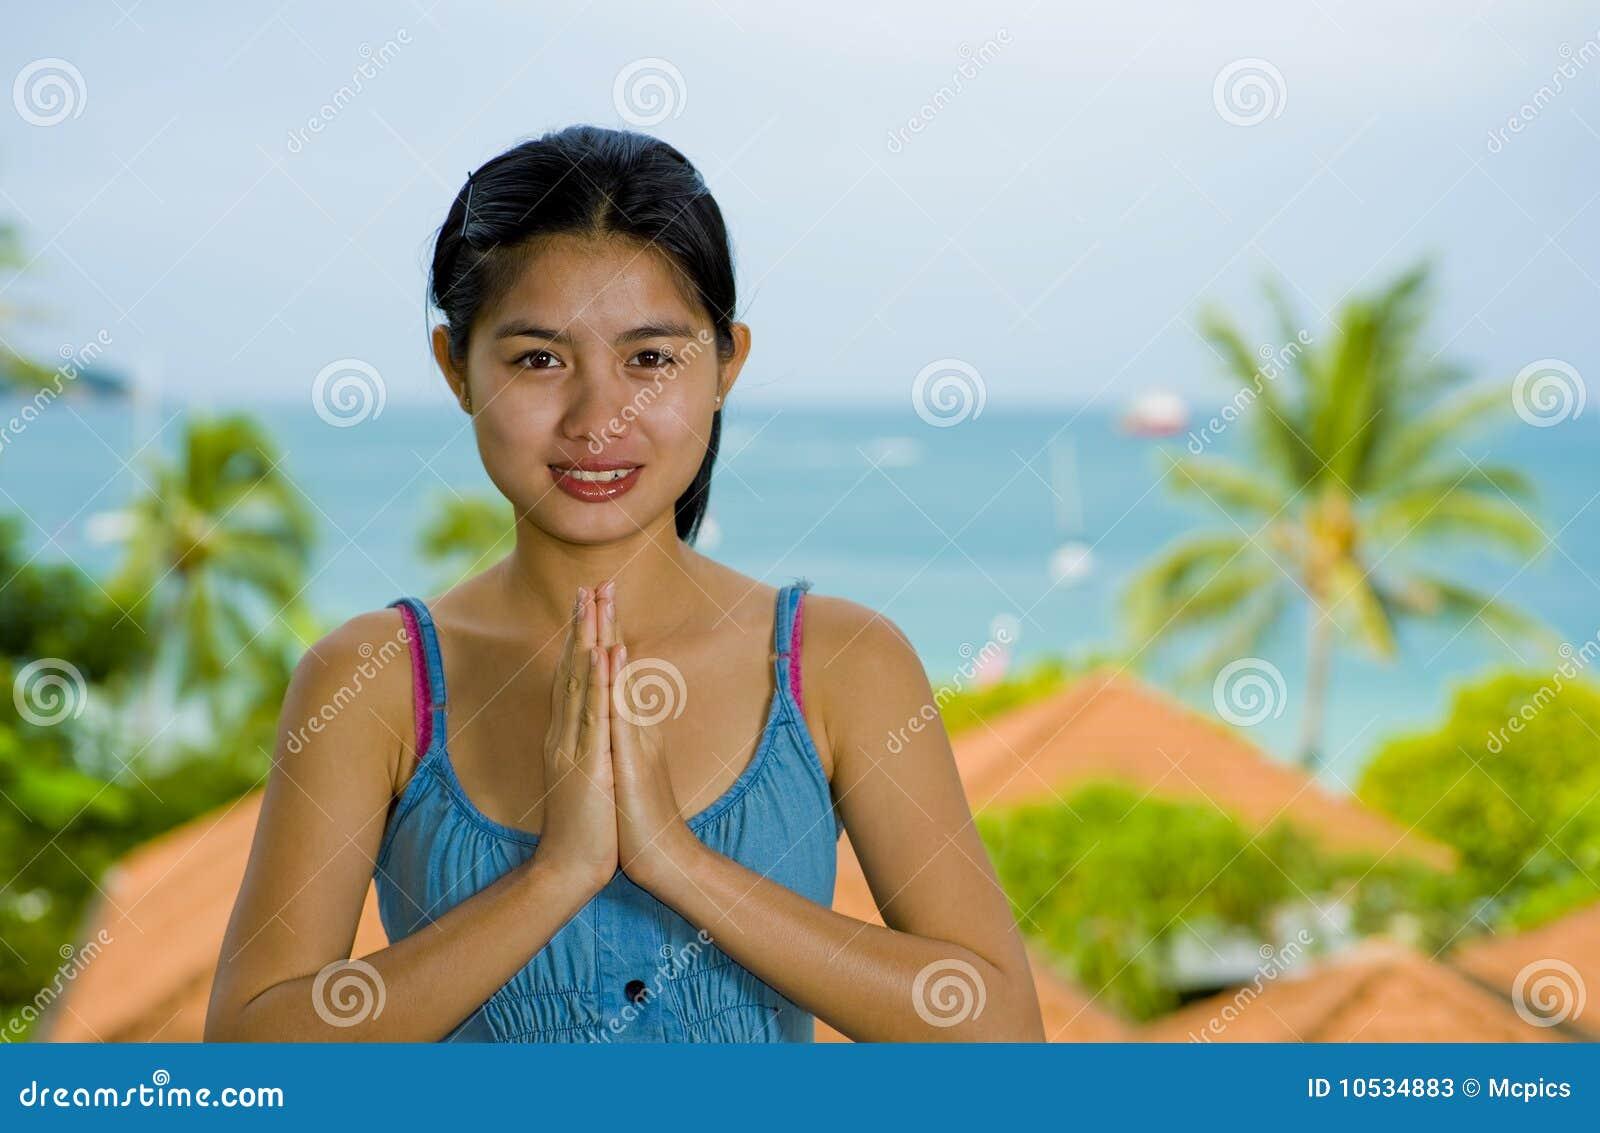 Фото женщин в тайланде 2 фотография